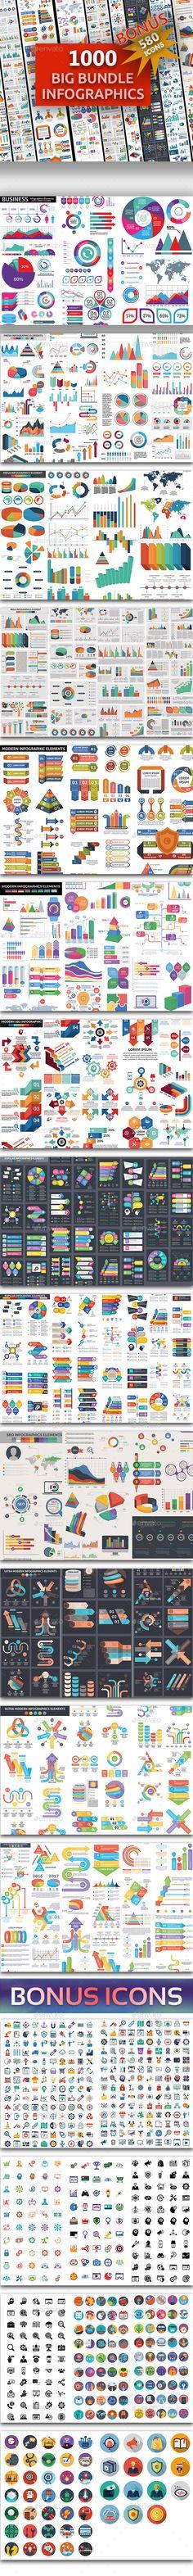 #Big #Bundle Infographics Elements - #Infographics Download here: https://graphicriver.net/item/big-bundle-infographics-elements/20337335?ref=alena994